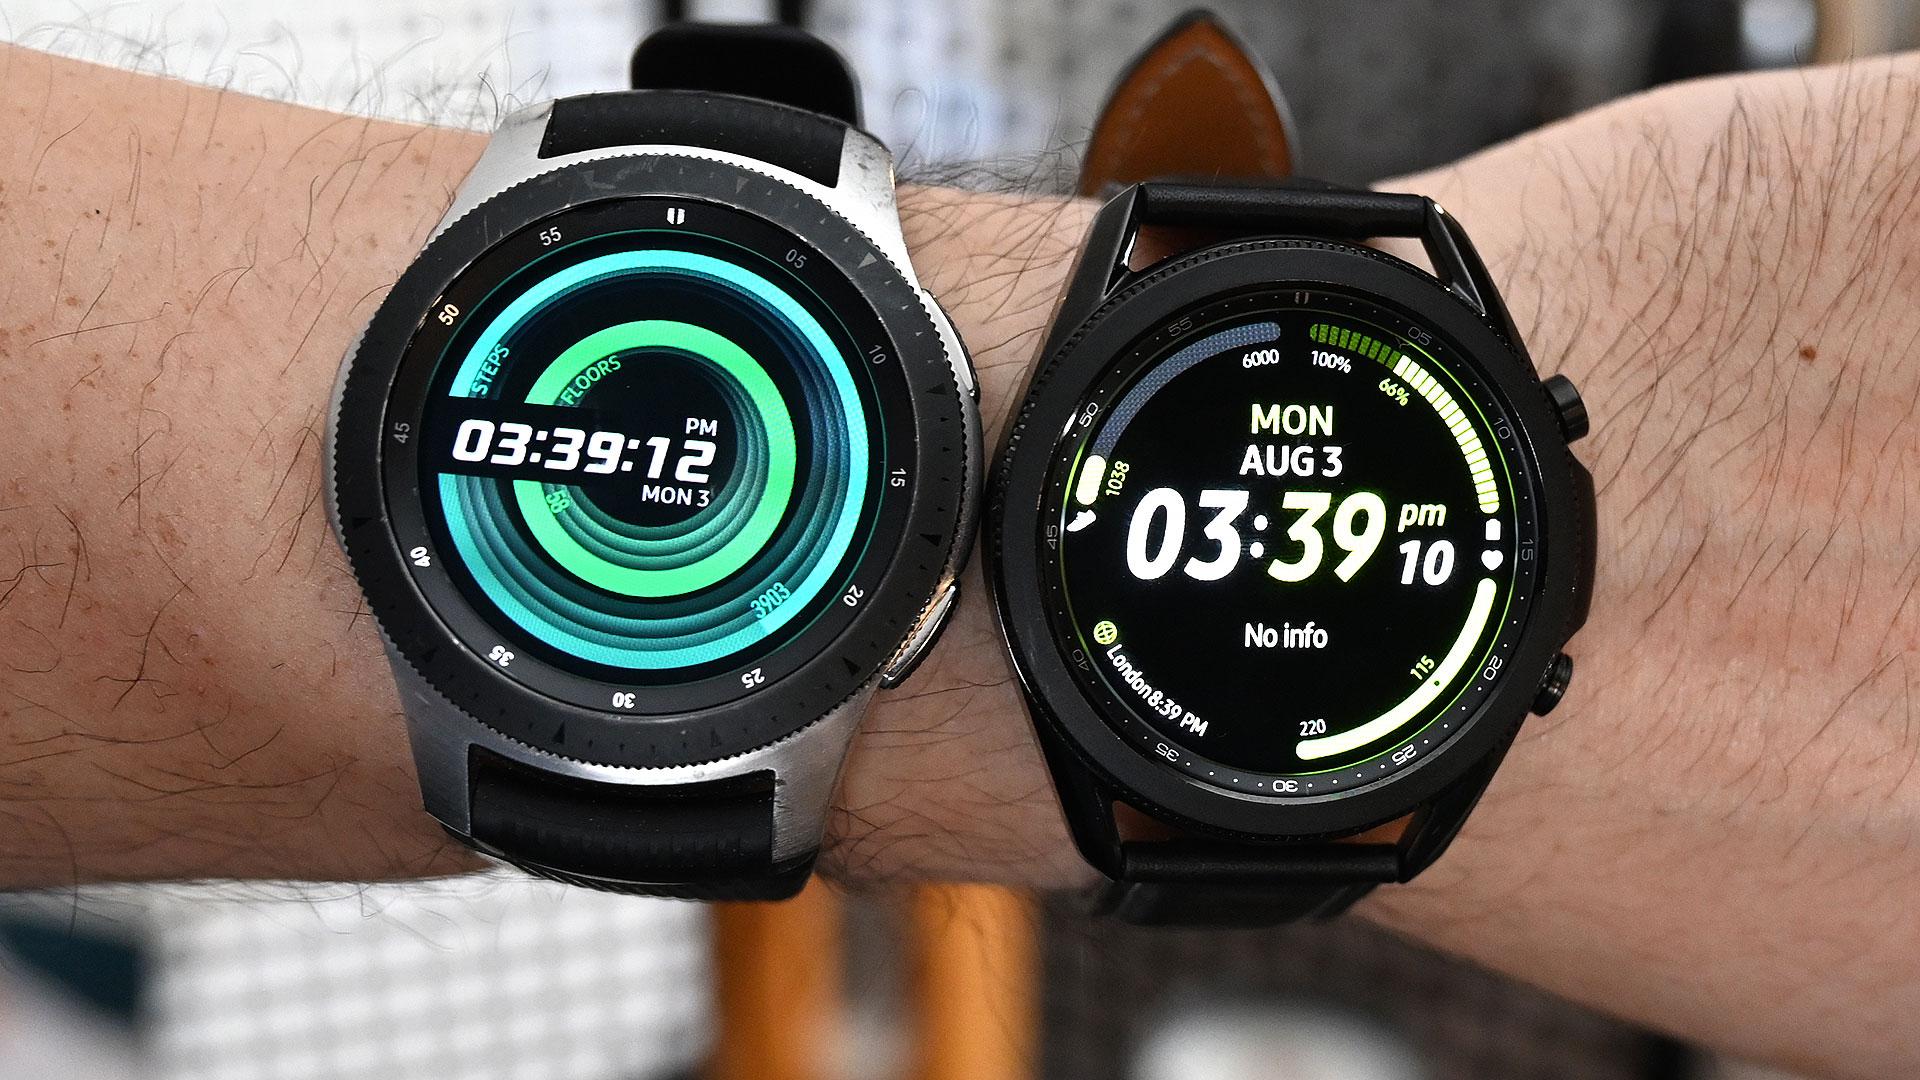 Os dois Galaxy Watch 3 de 41 mm e 44 mm. Crédito: Sam Rutherford/Gizmodo